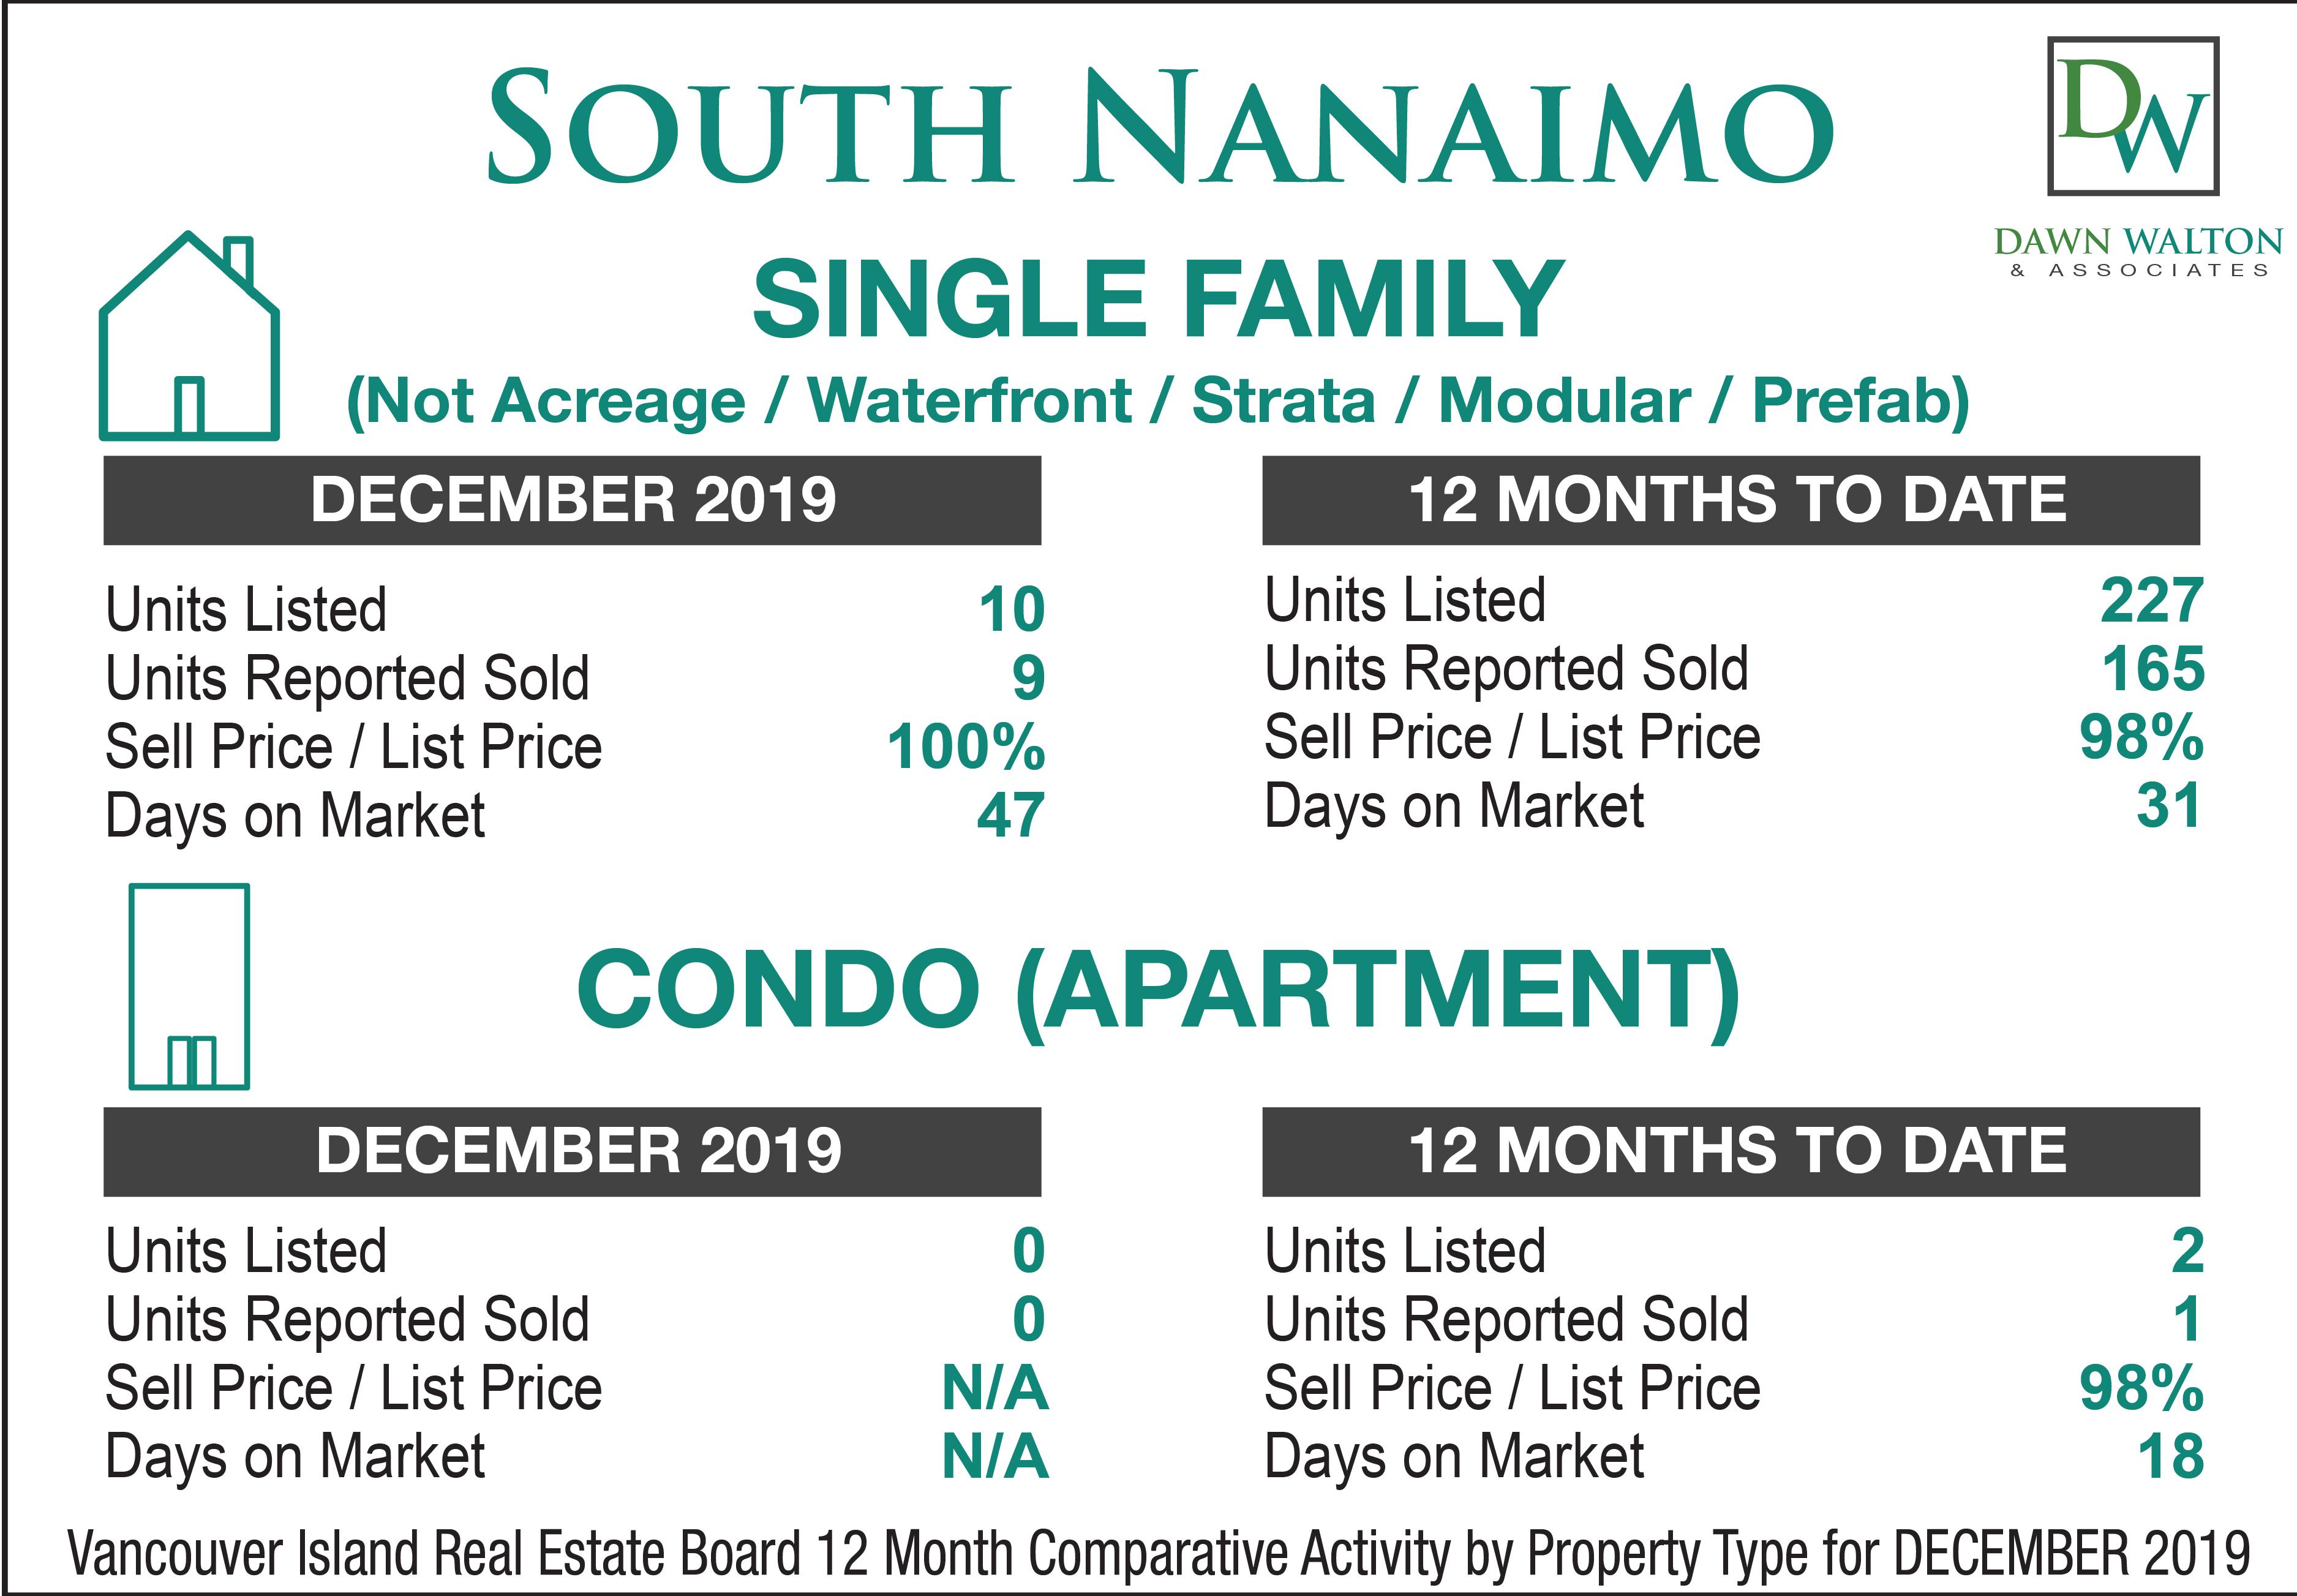 South Nanaimo Real Estate Market Stats December  2019 - Nanaimo Realtor Dawn Walton